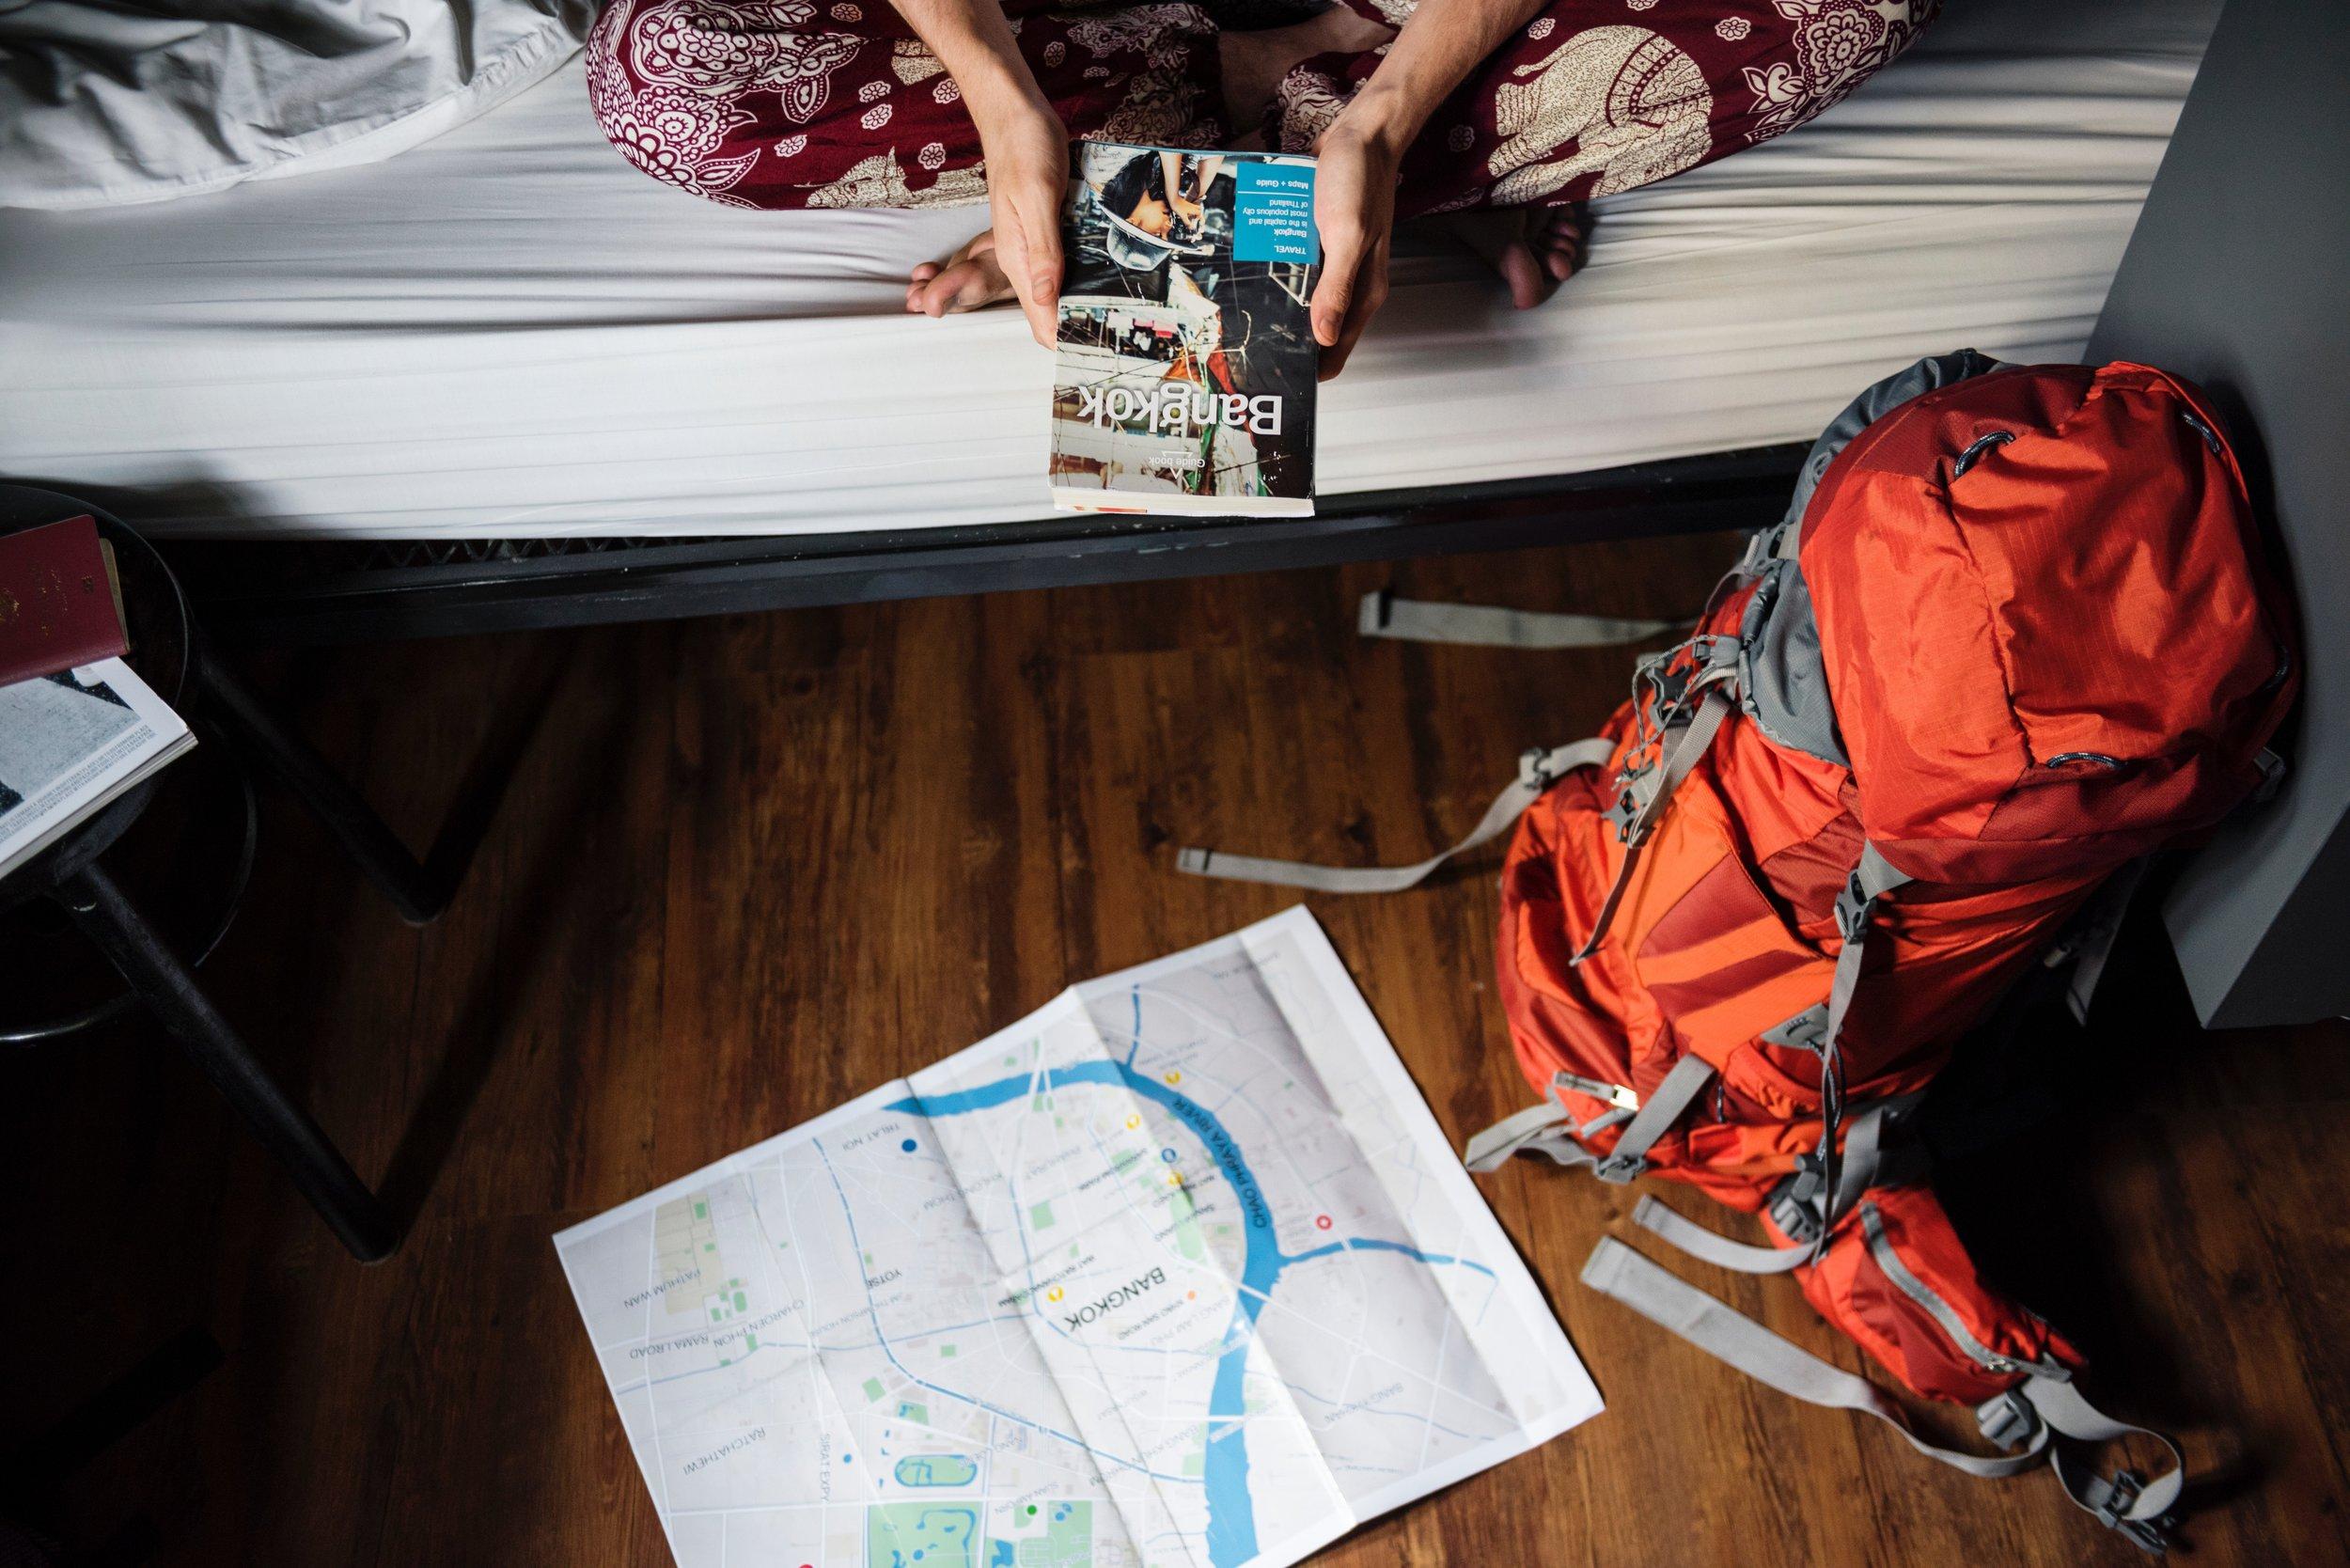 adult-backpack-backpacker-721169.jpg